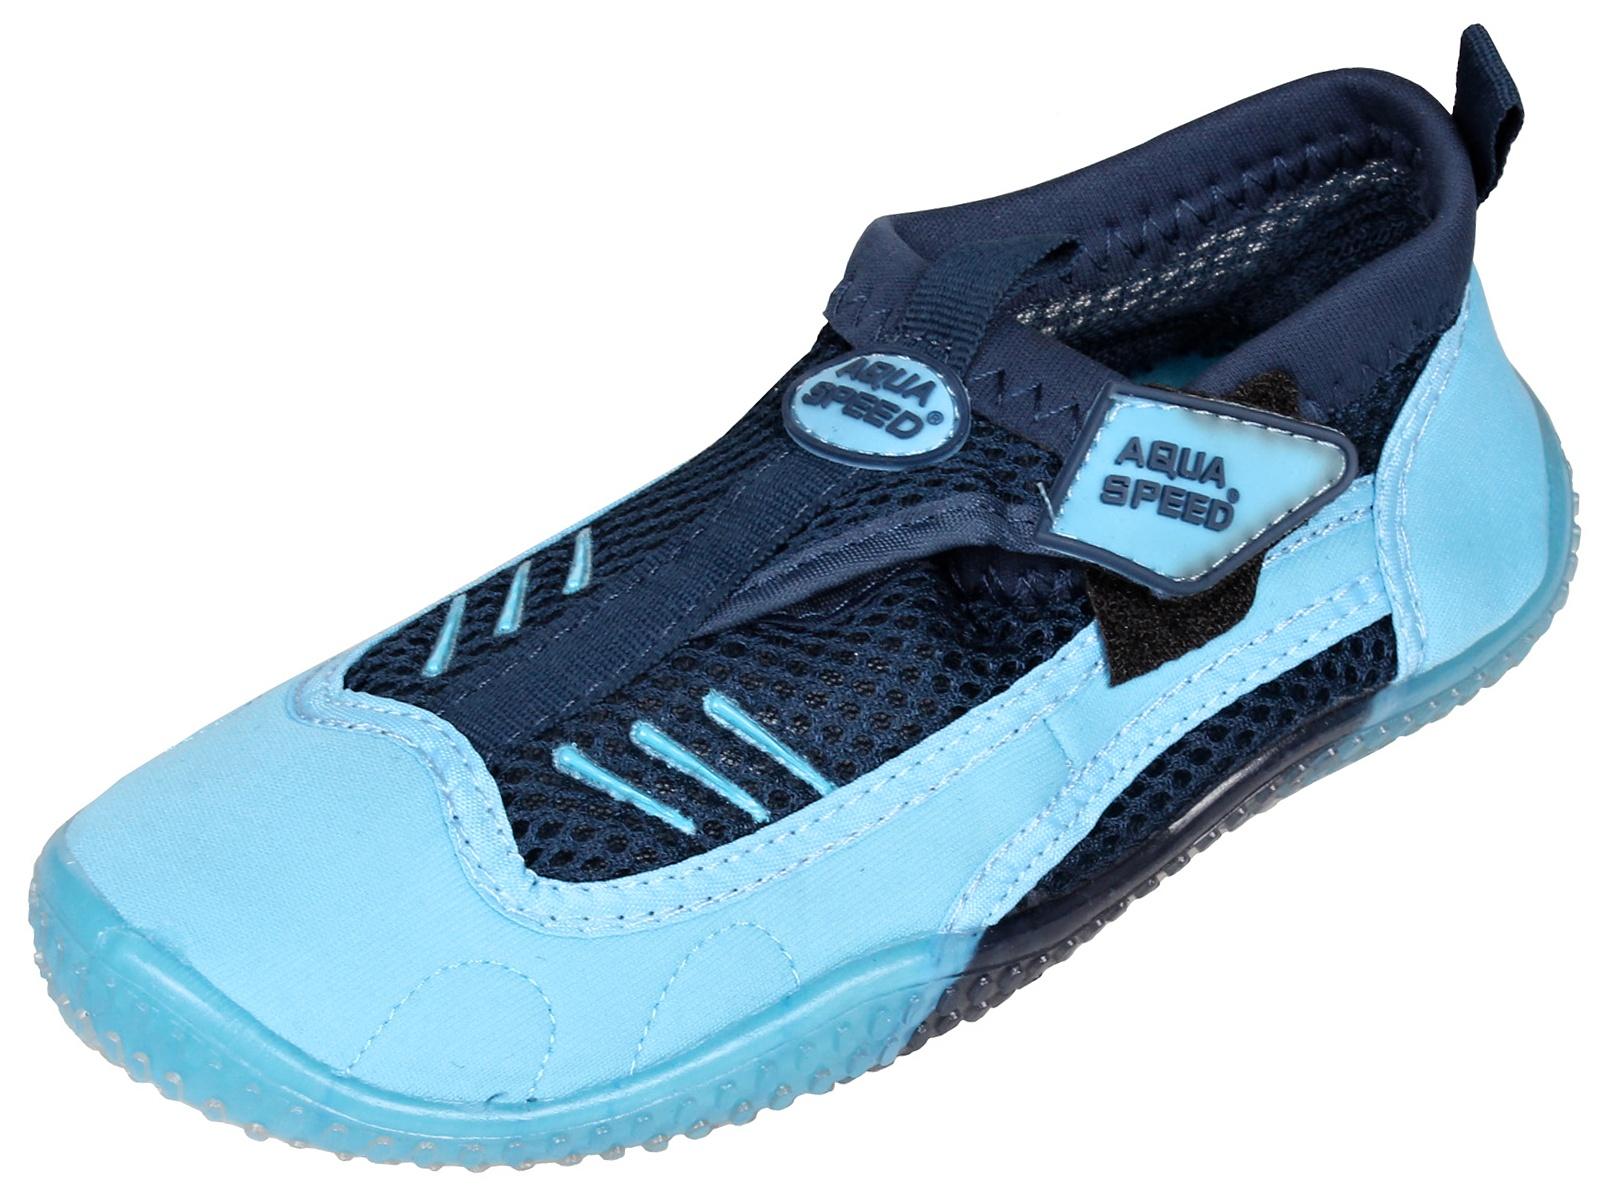 Topánky do vody AQUA-SPEED 7A modré